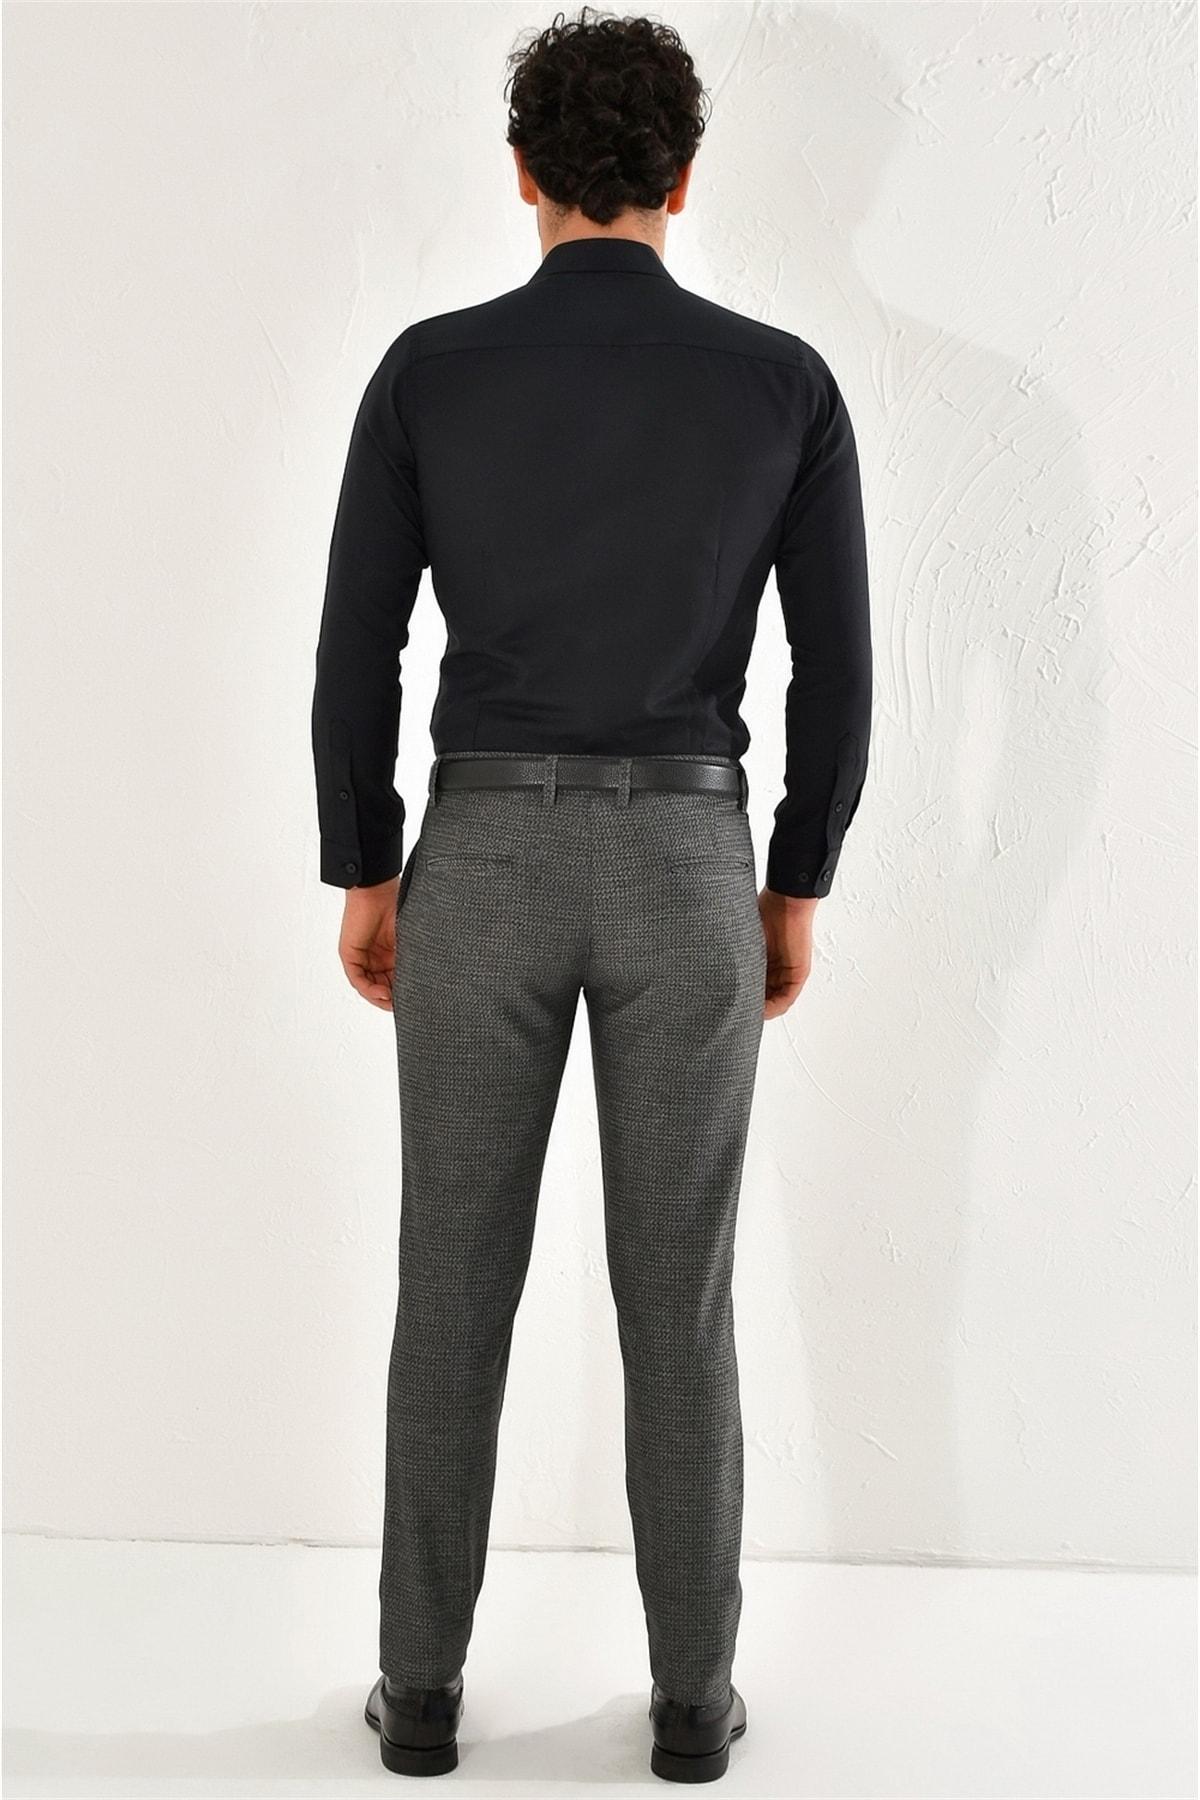 Efor P 1065 Slim Fit Siyah Spor Pantolon 2